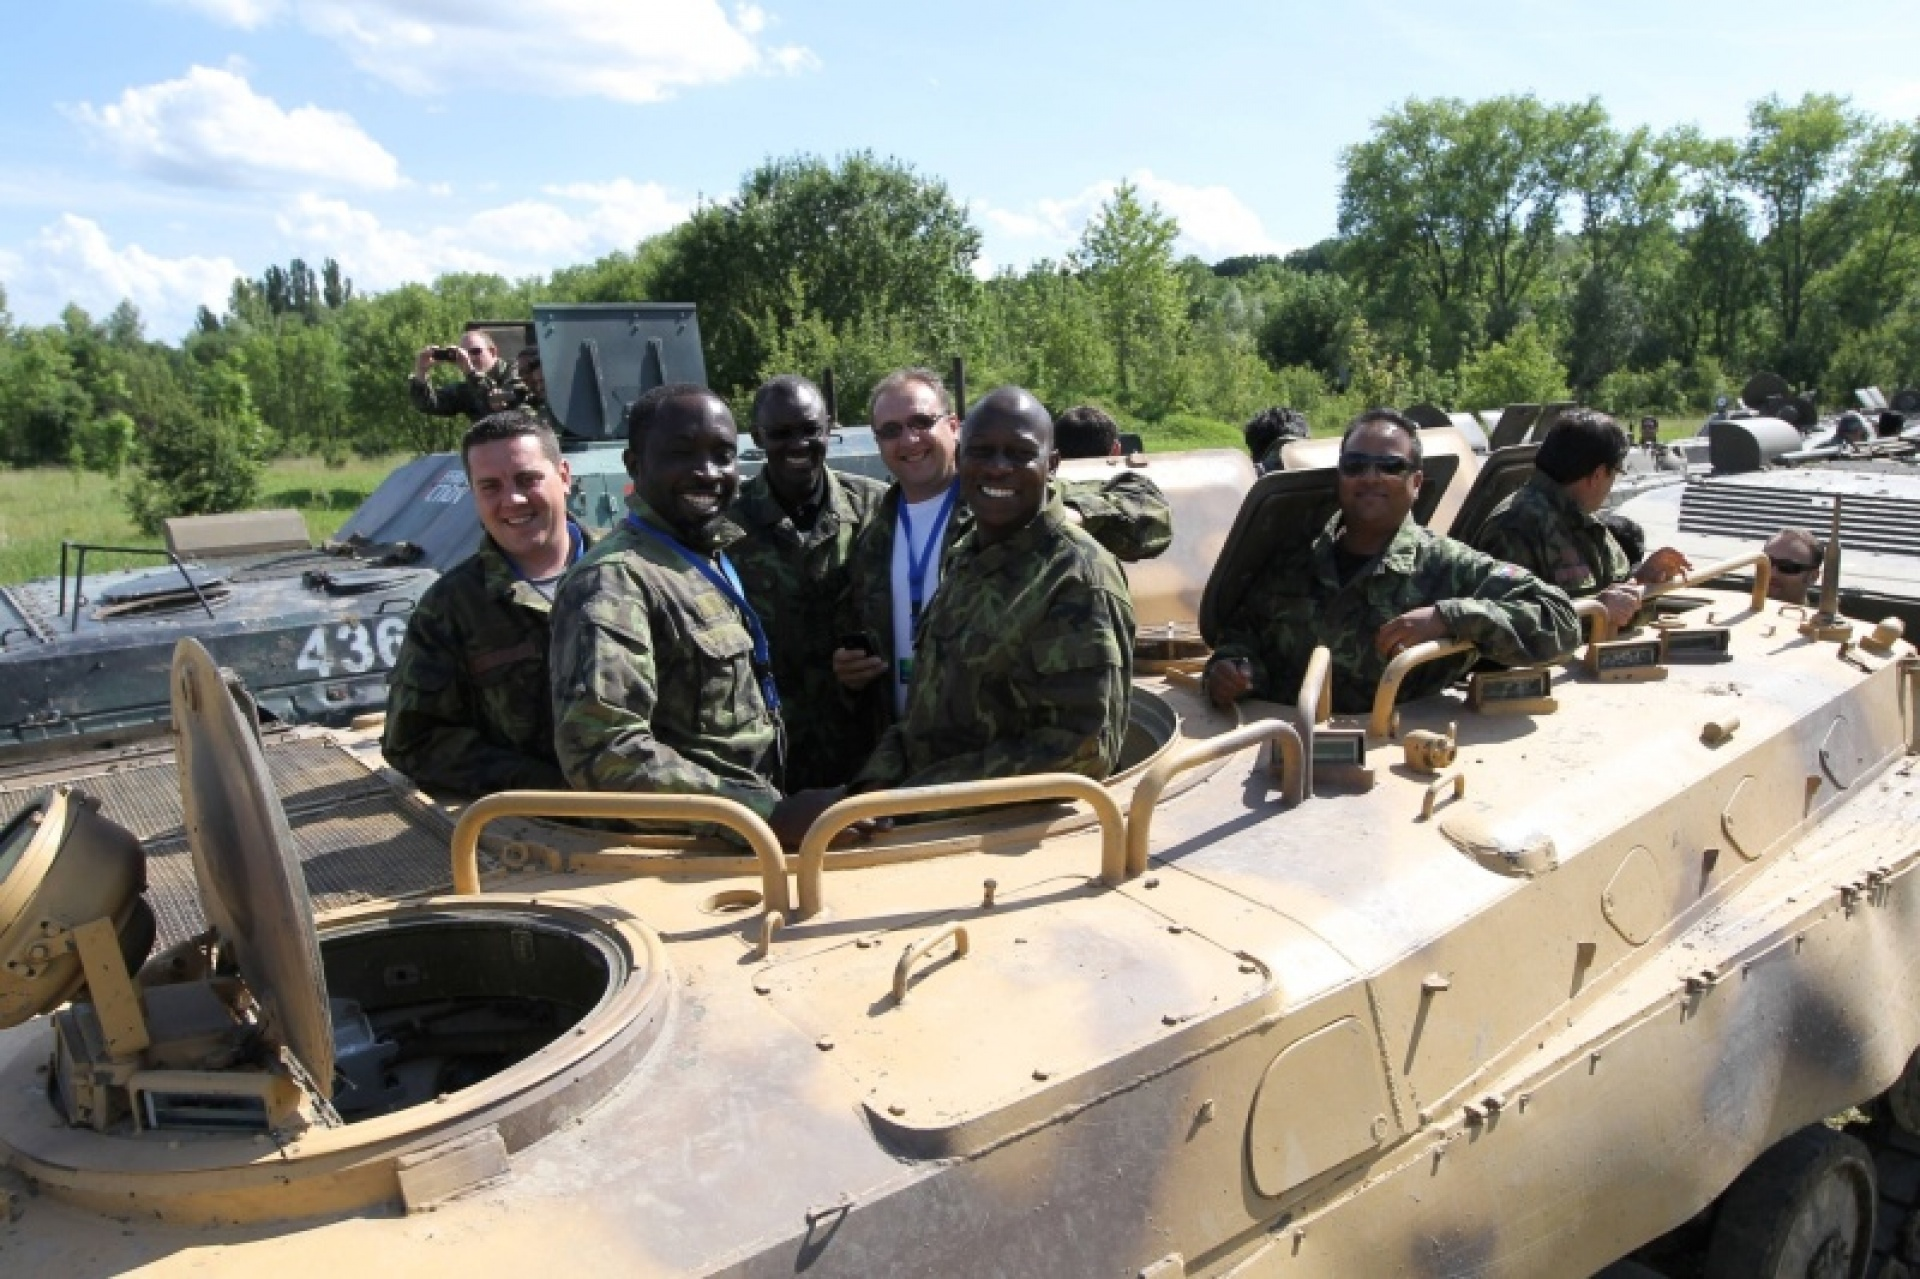 People in BMP-1